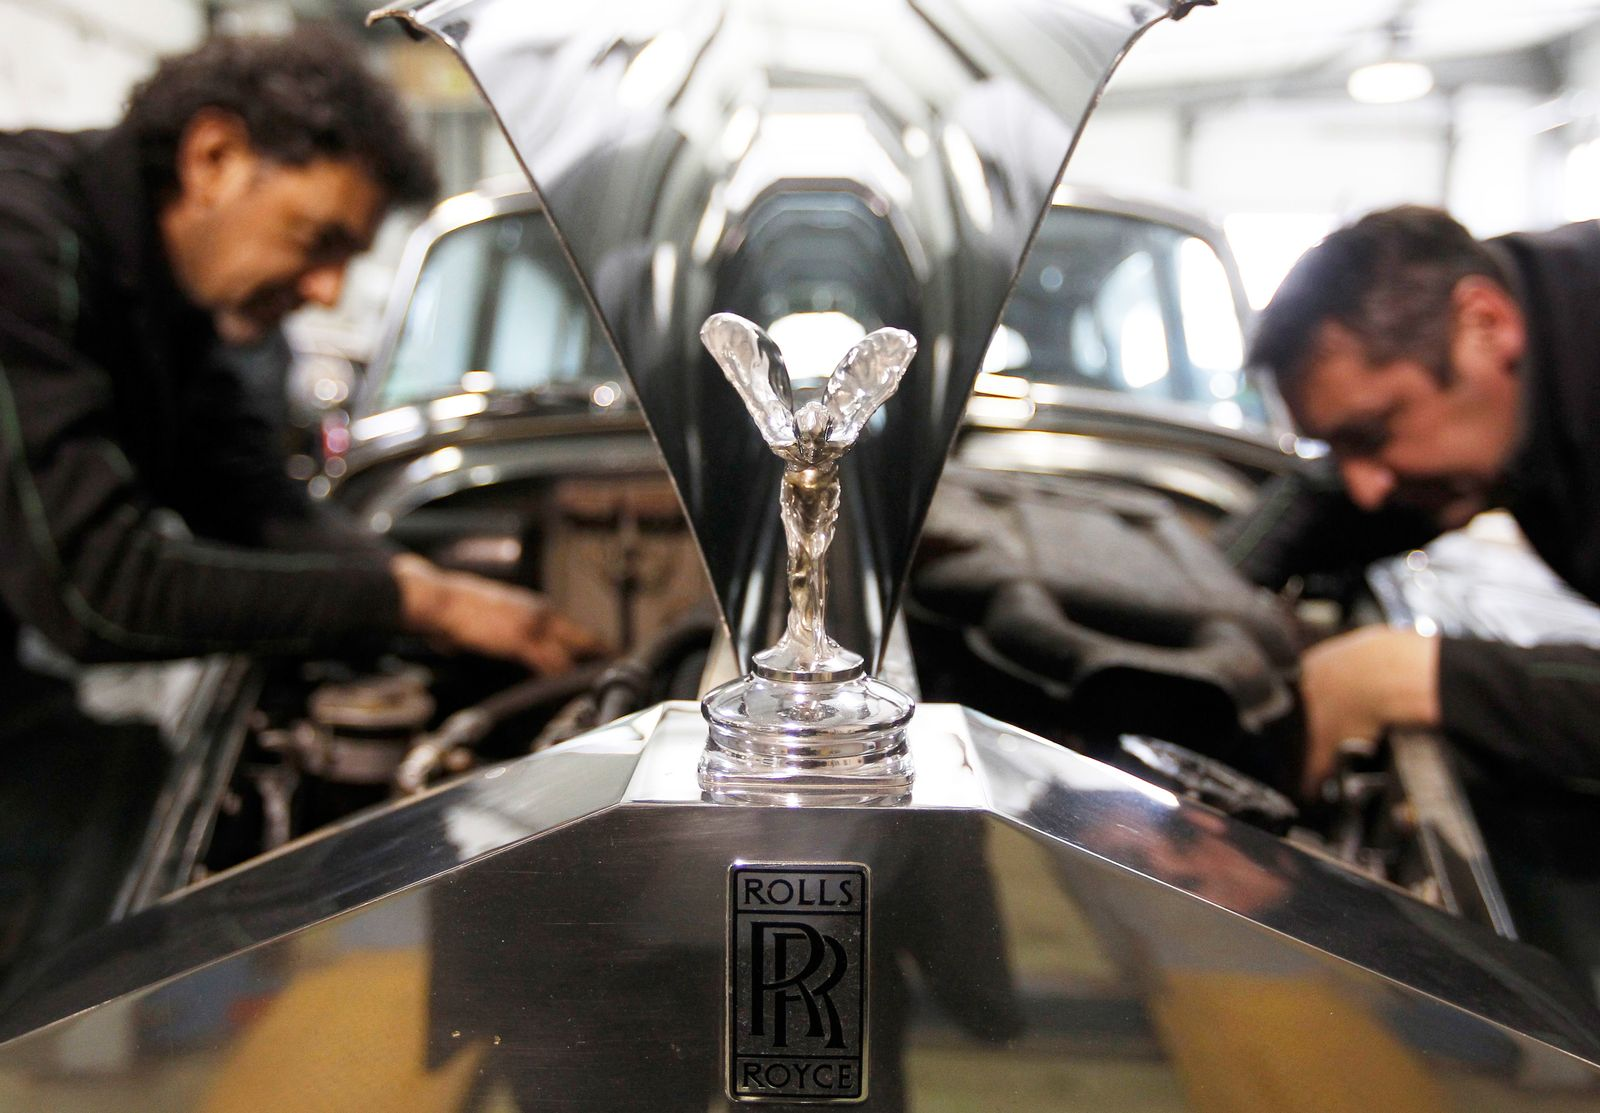 Rolls-Royce / Produktion